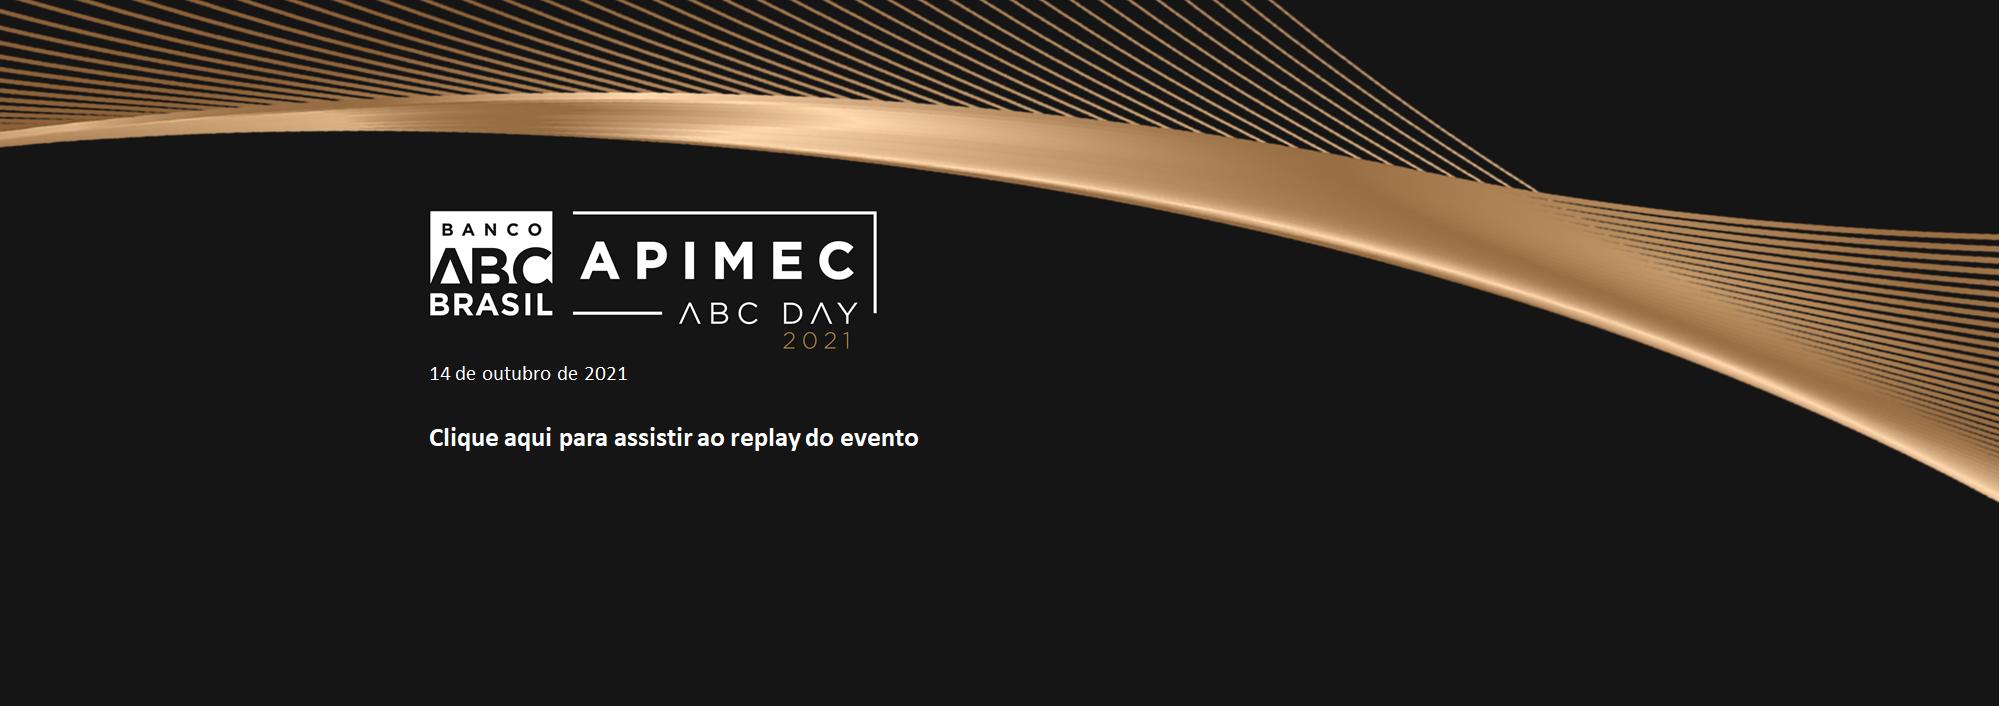 Banner APIMEC ABC Day 2021